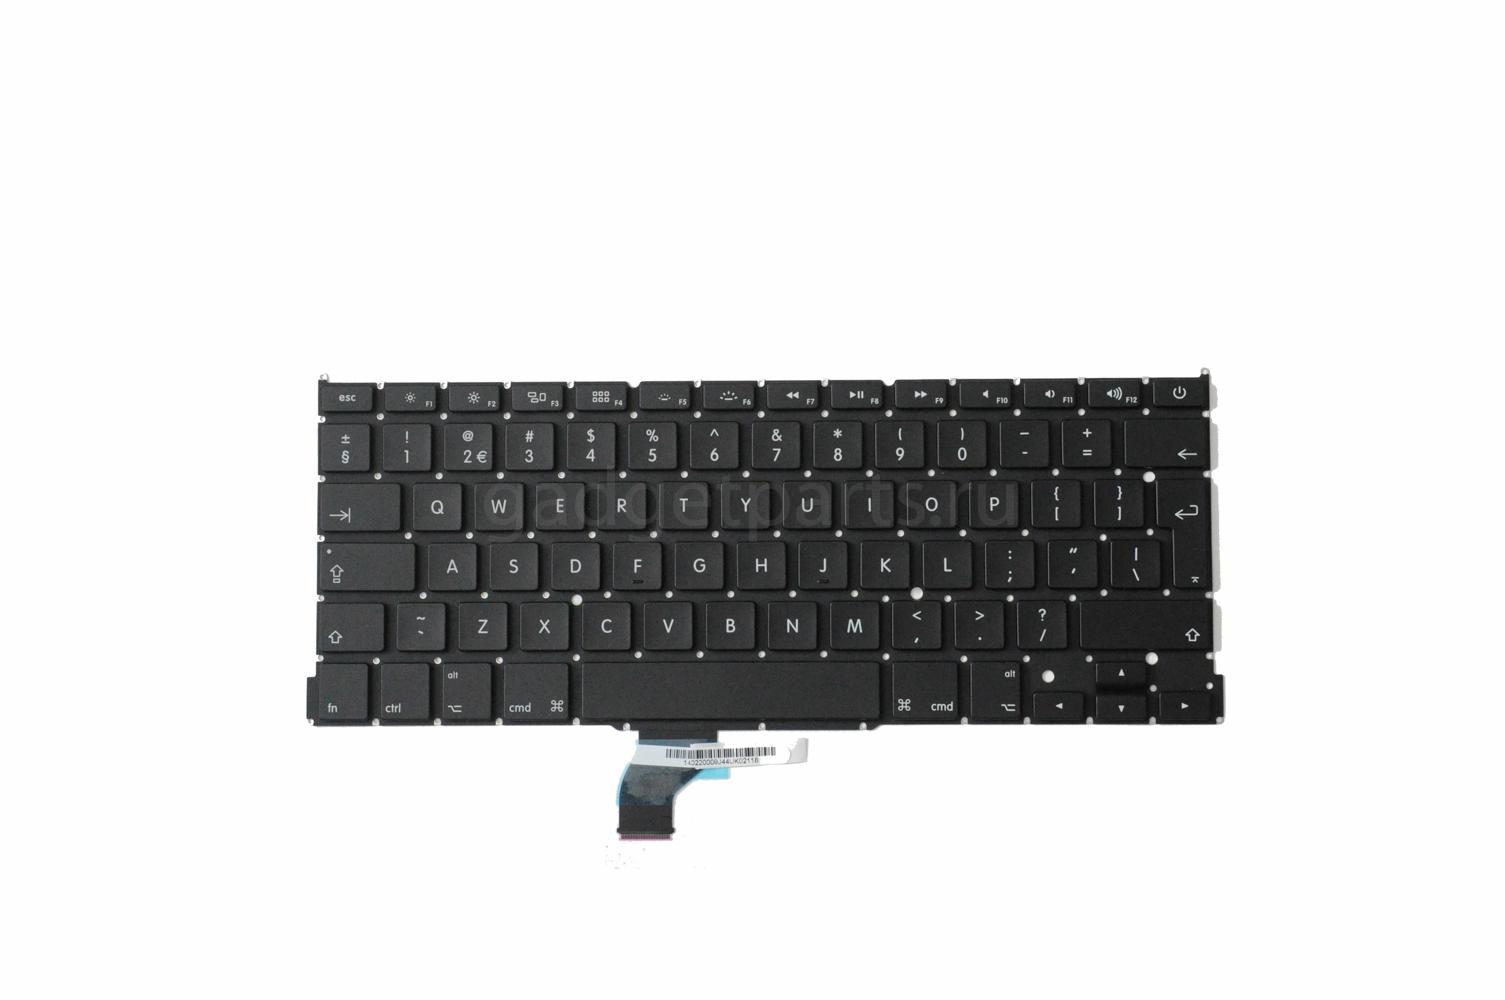 Клавиатура MacBook Pro Retina 13 A1502 2013 год